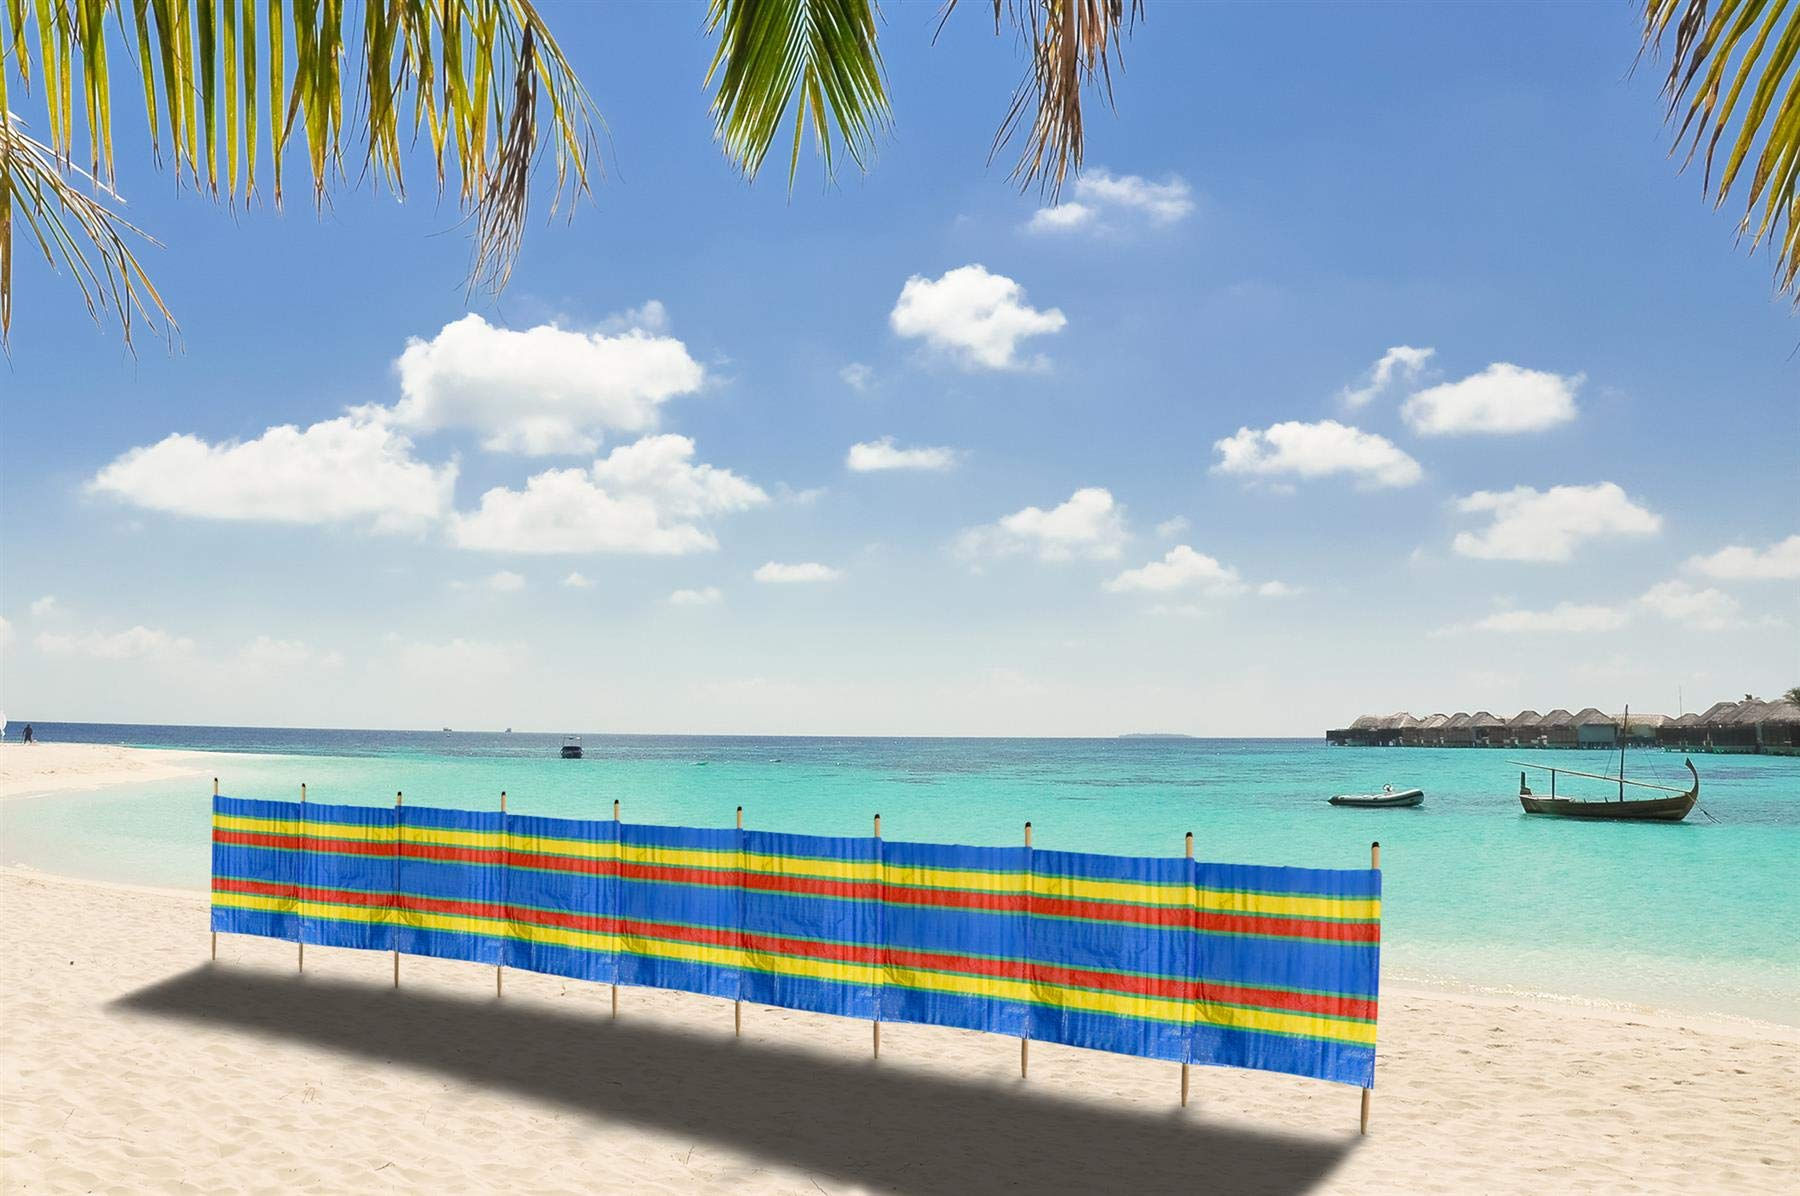 Vinsani® 4, 5, 6, 8, 10 POLE BEACH HOLIDAY CARAVAN CAMPING WINDBREAK TALL WINDBREAKERS 2